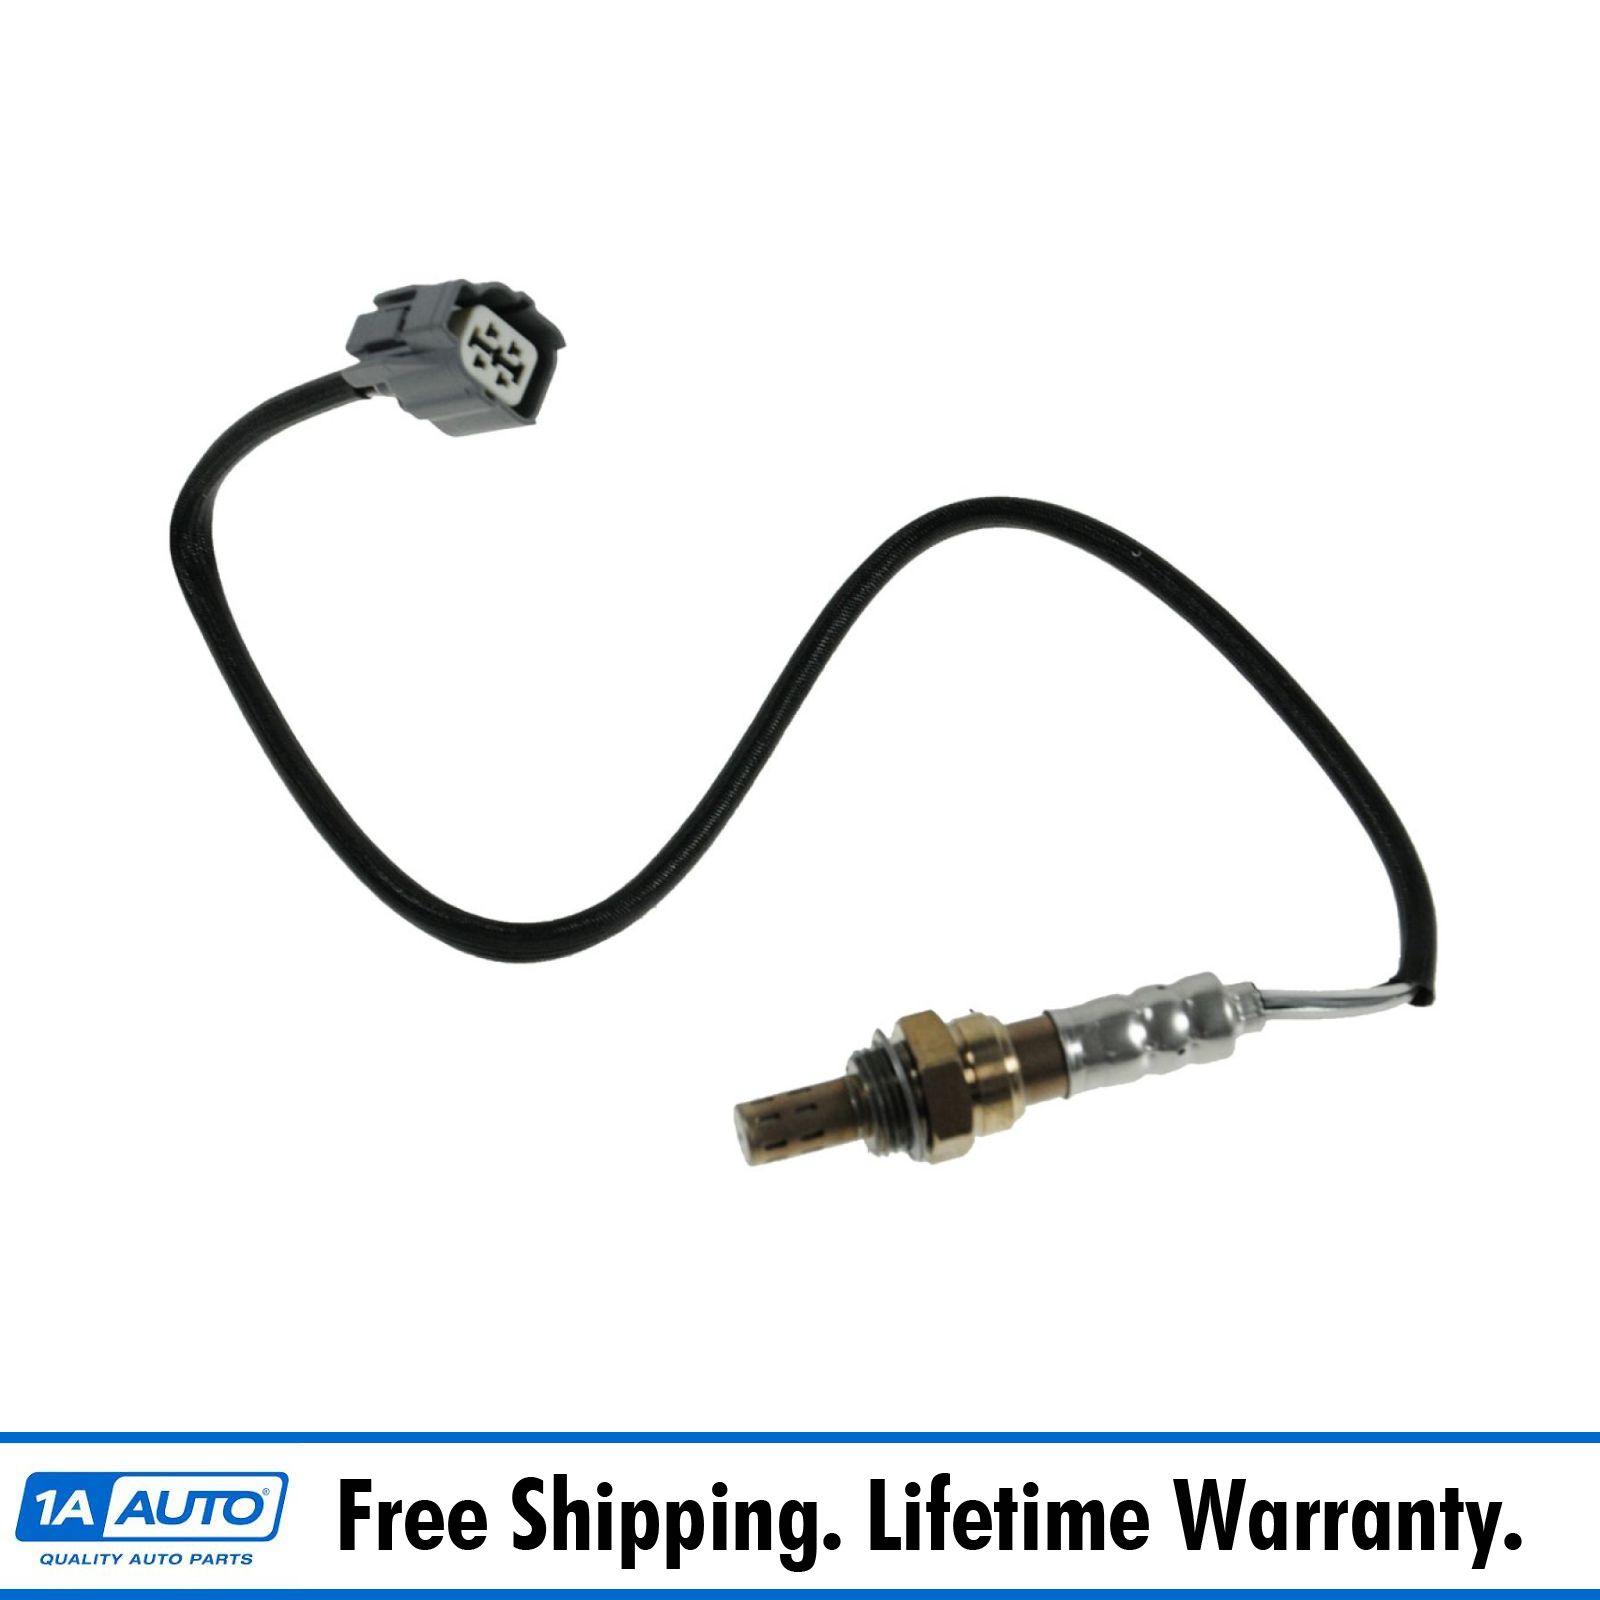 Engine Exhaust O2 02 Oxygen Sensor Direct Fit Downstream for Acura Honda